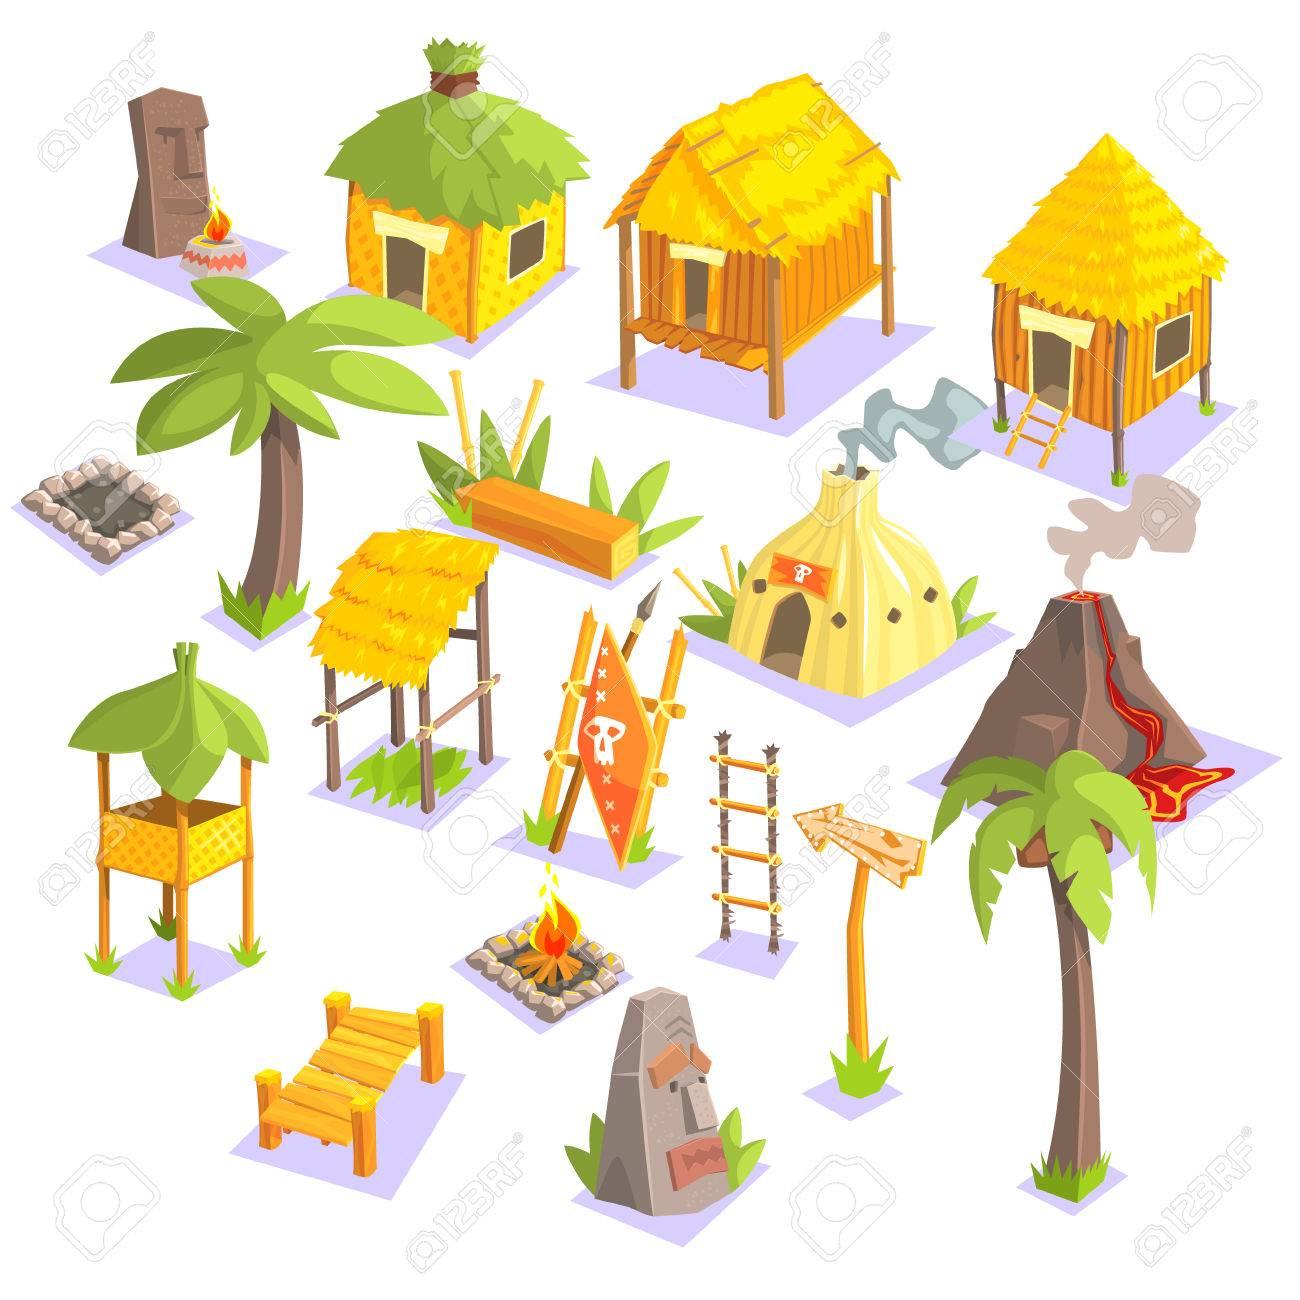 Jungle Tribal Leben Häuser Und Andere Objekte Kühle Bunte Vektor ...